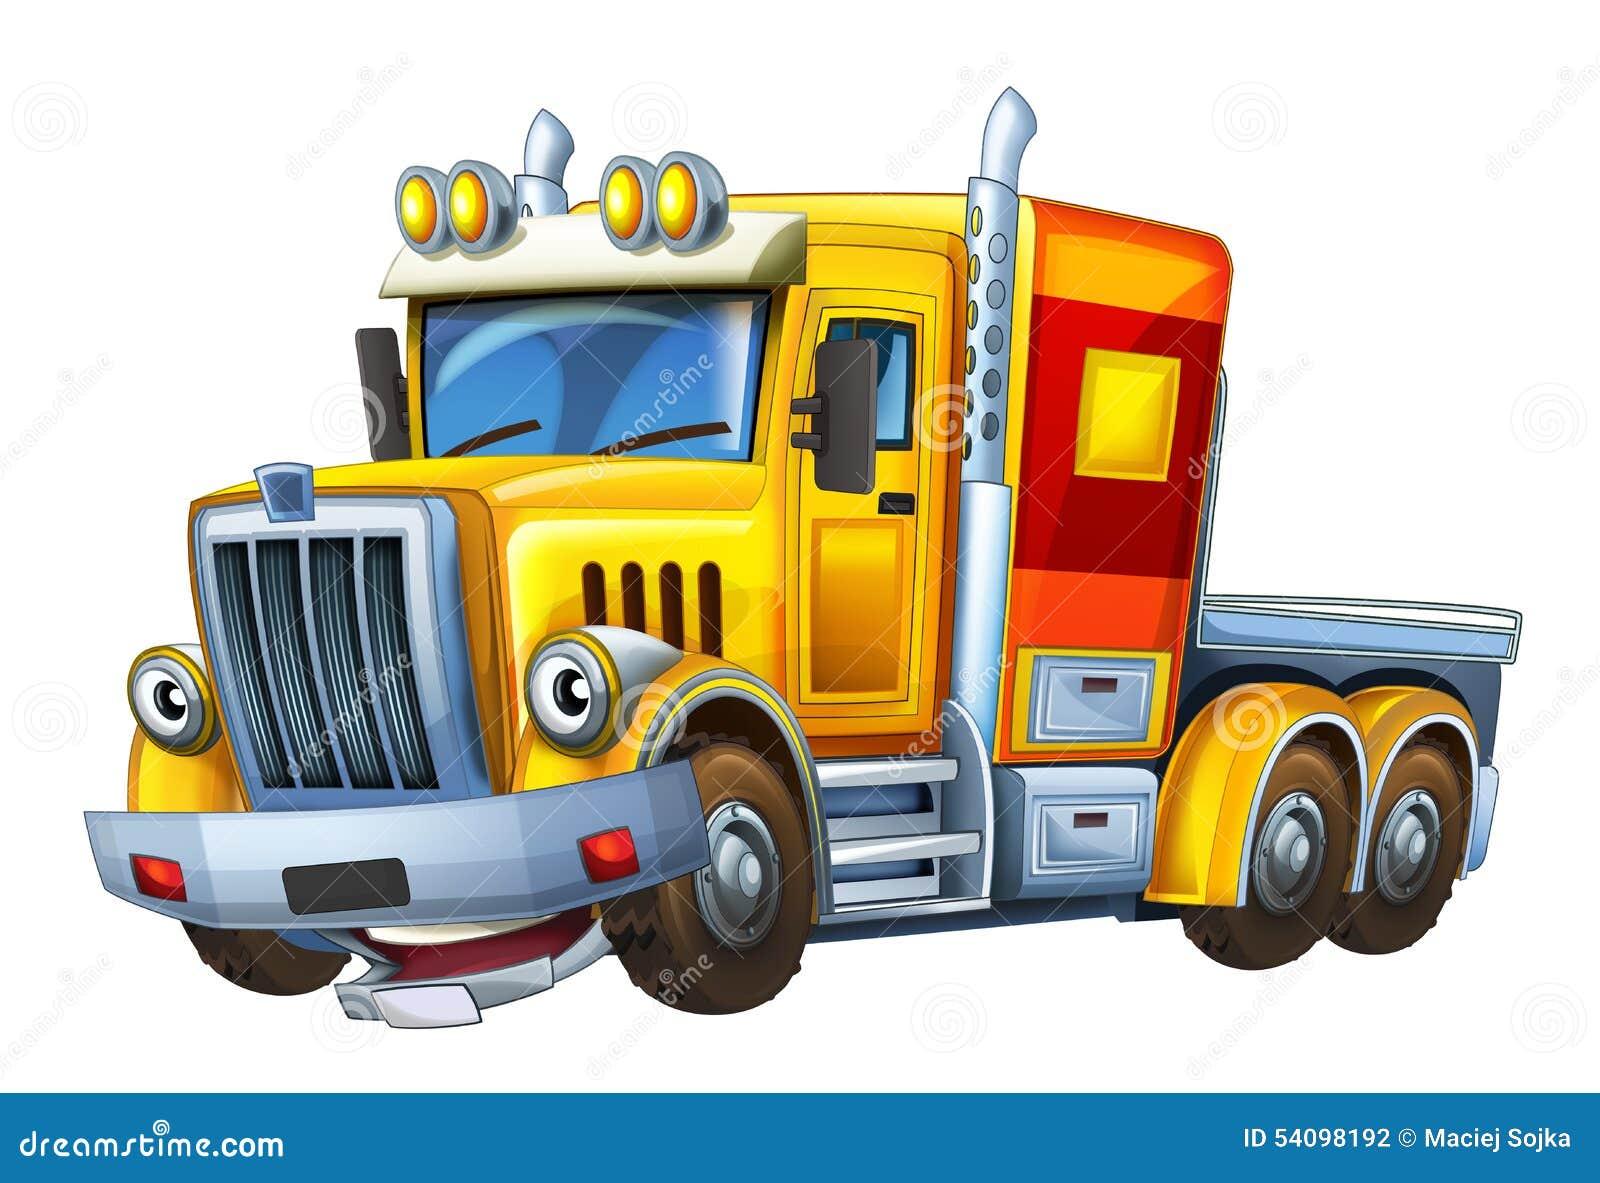 Cartoon Truck Caricature Illustration For The Children